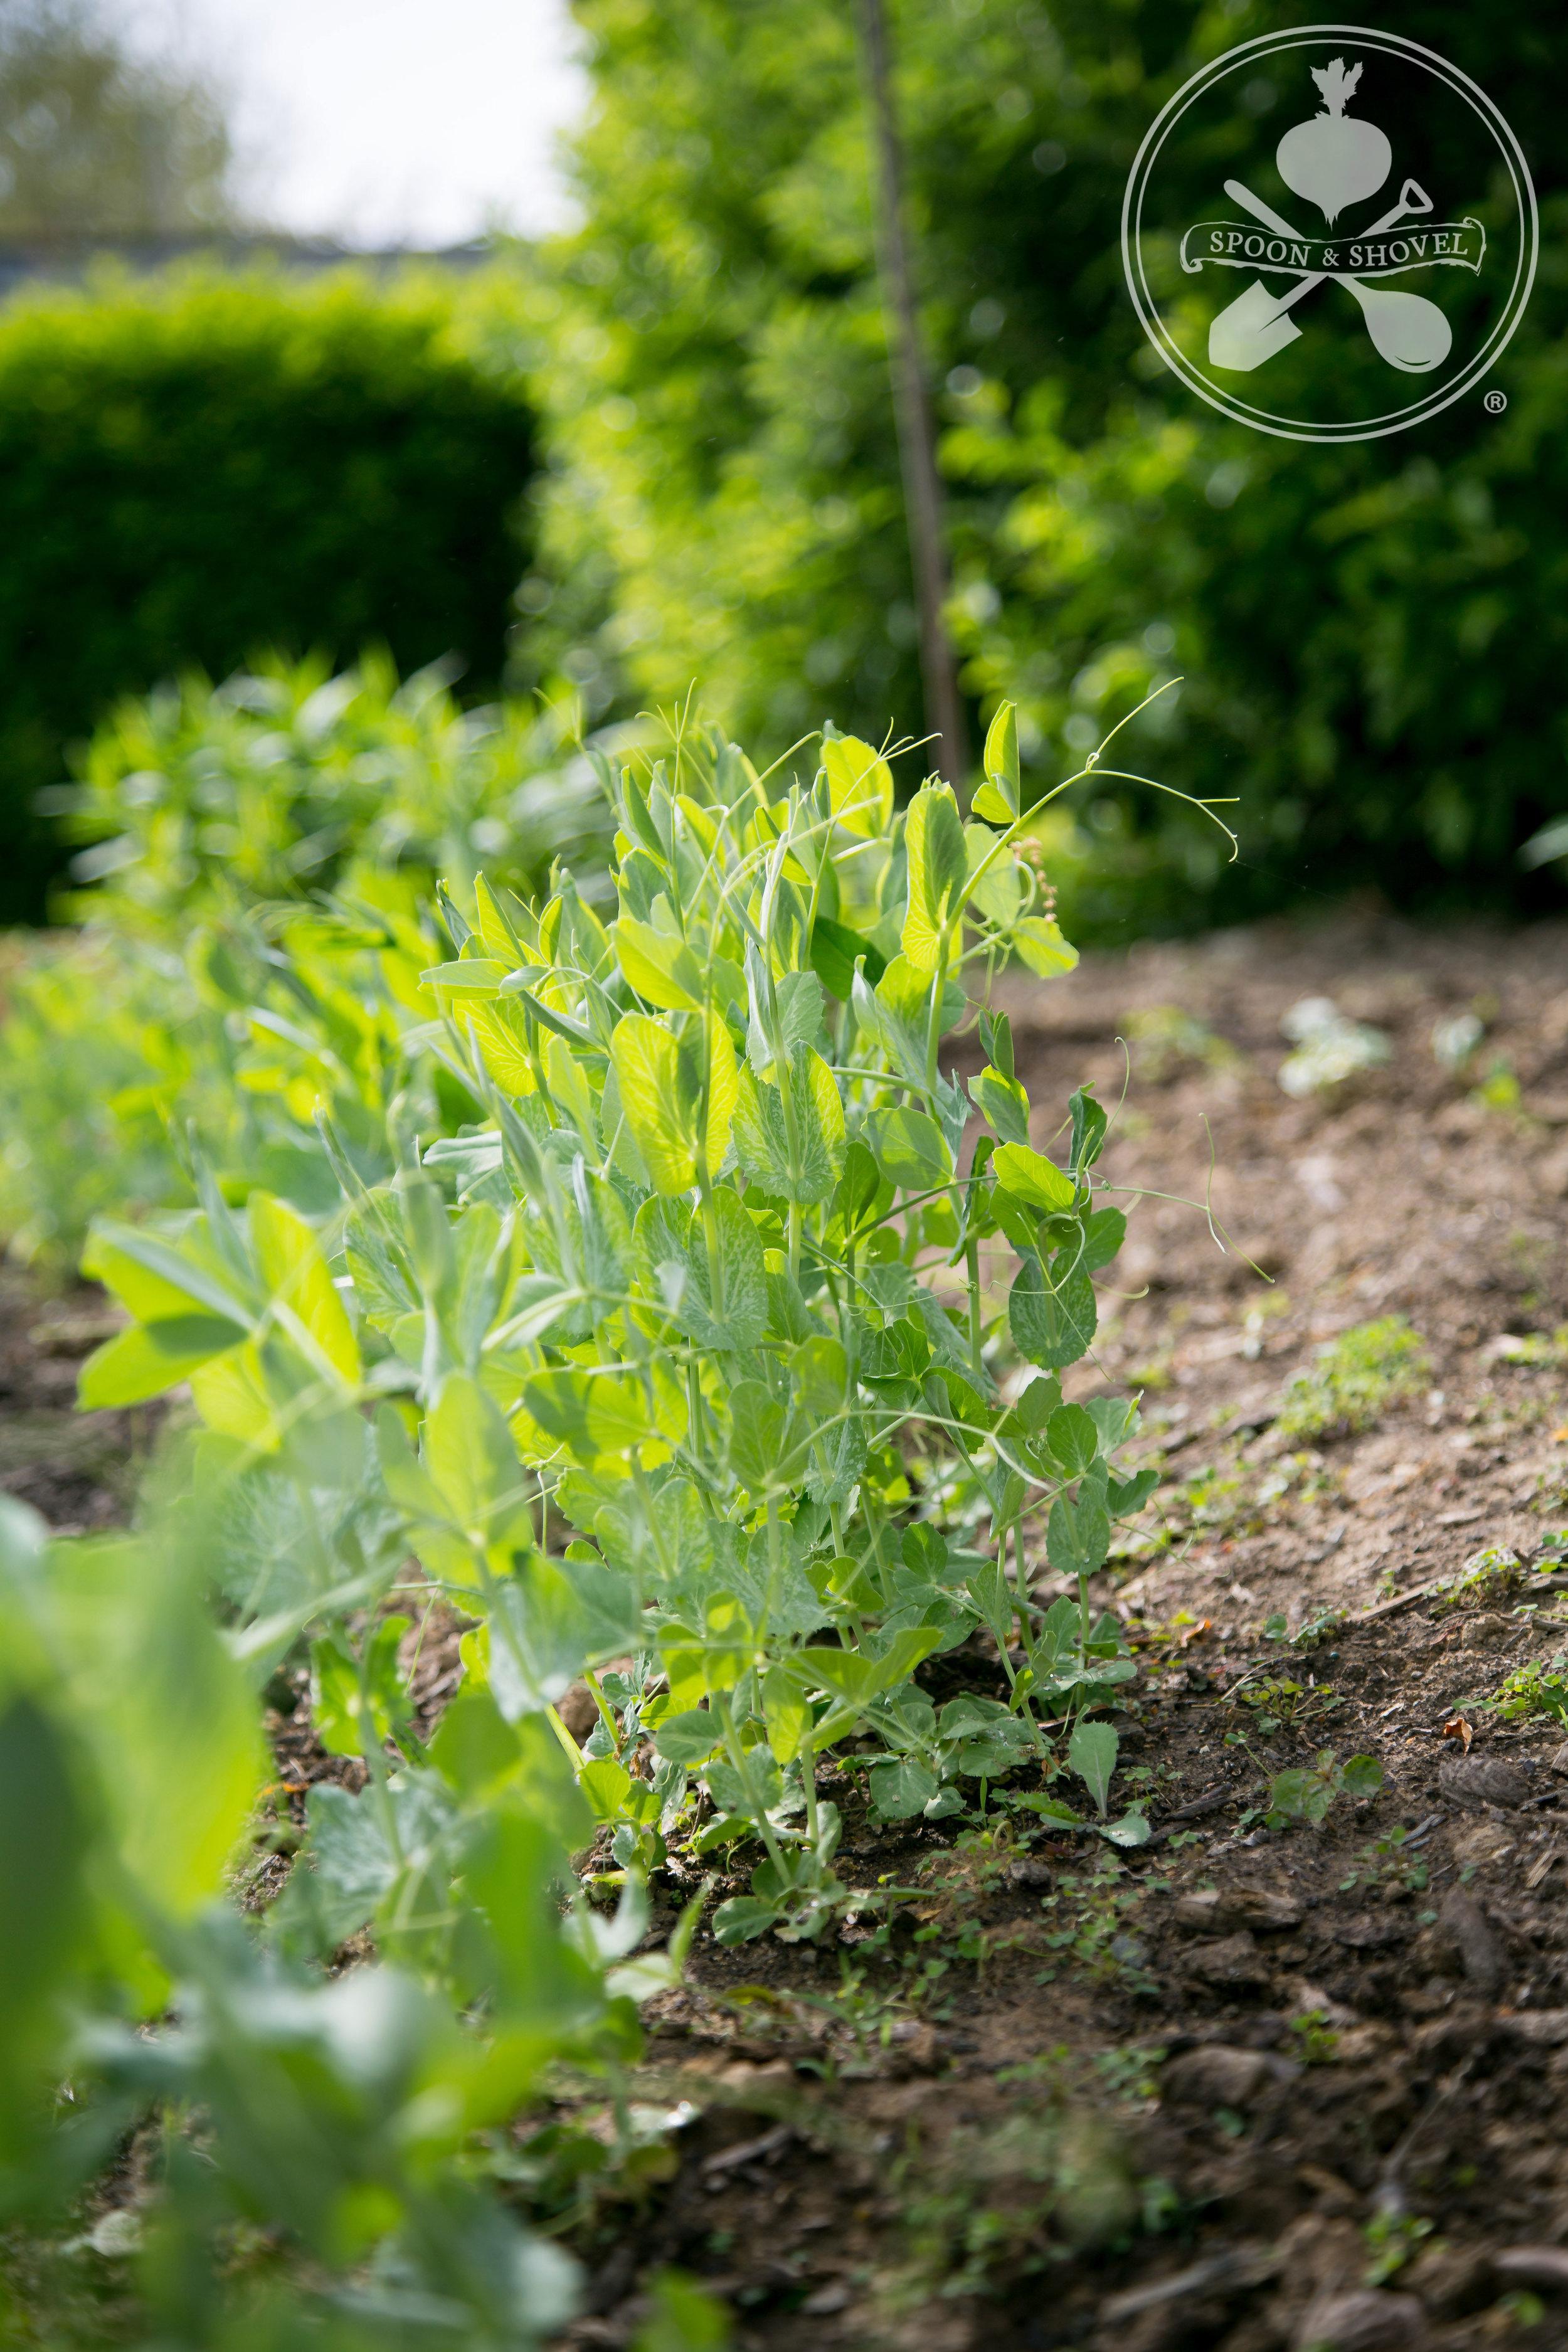 Garden update II (summer 2015) from The Spoon + Shovel